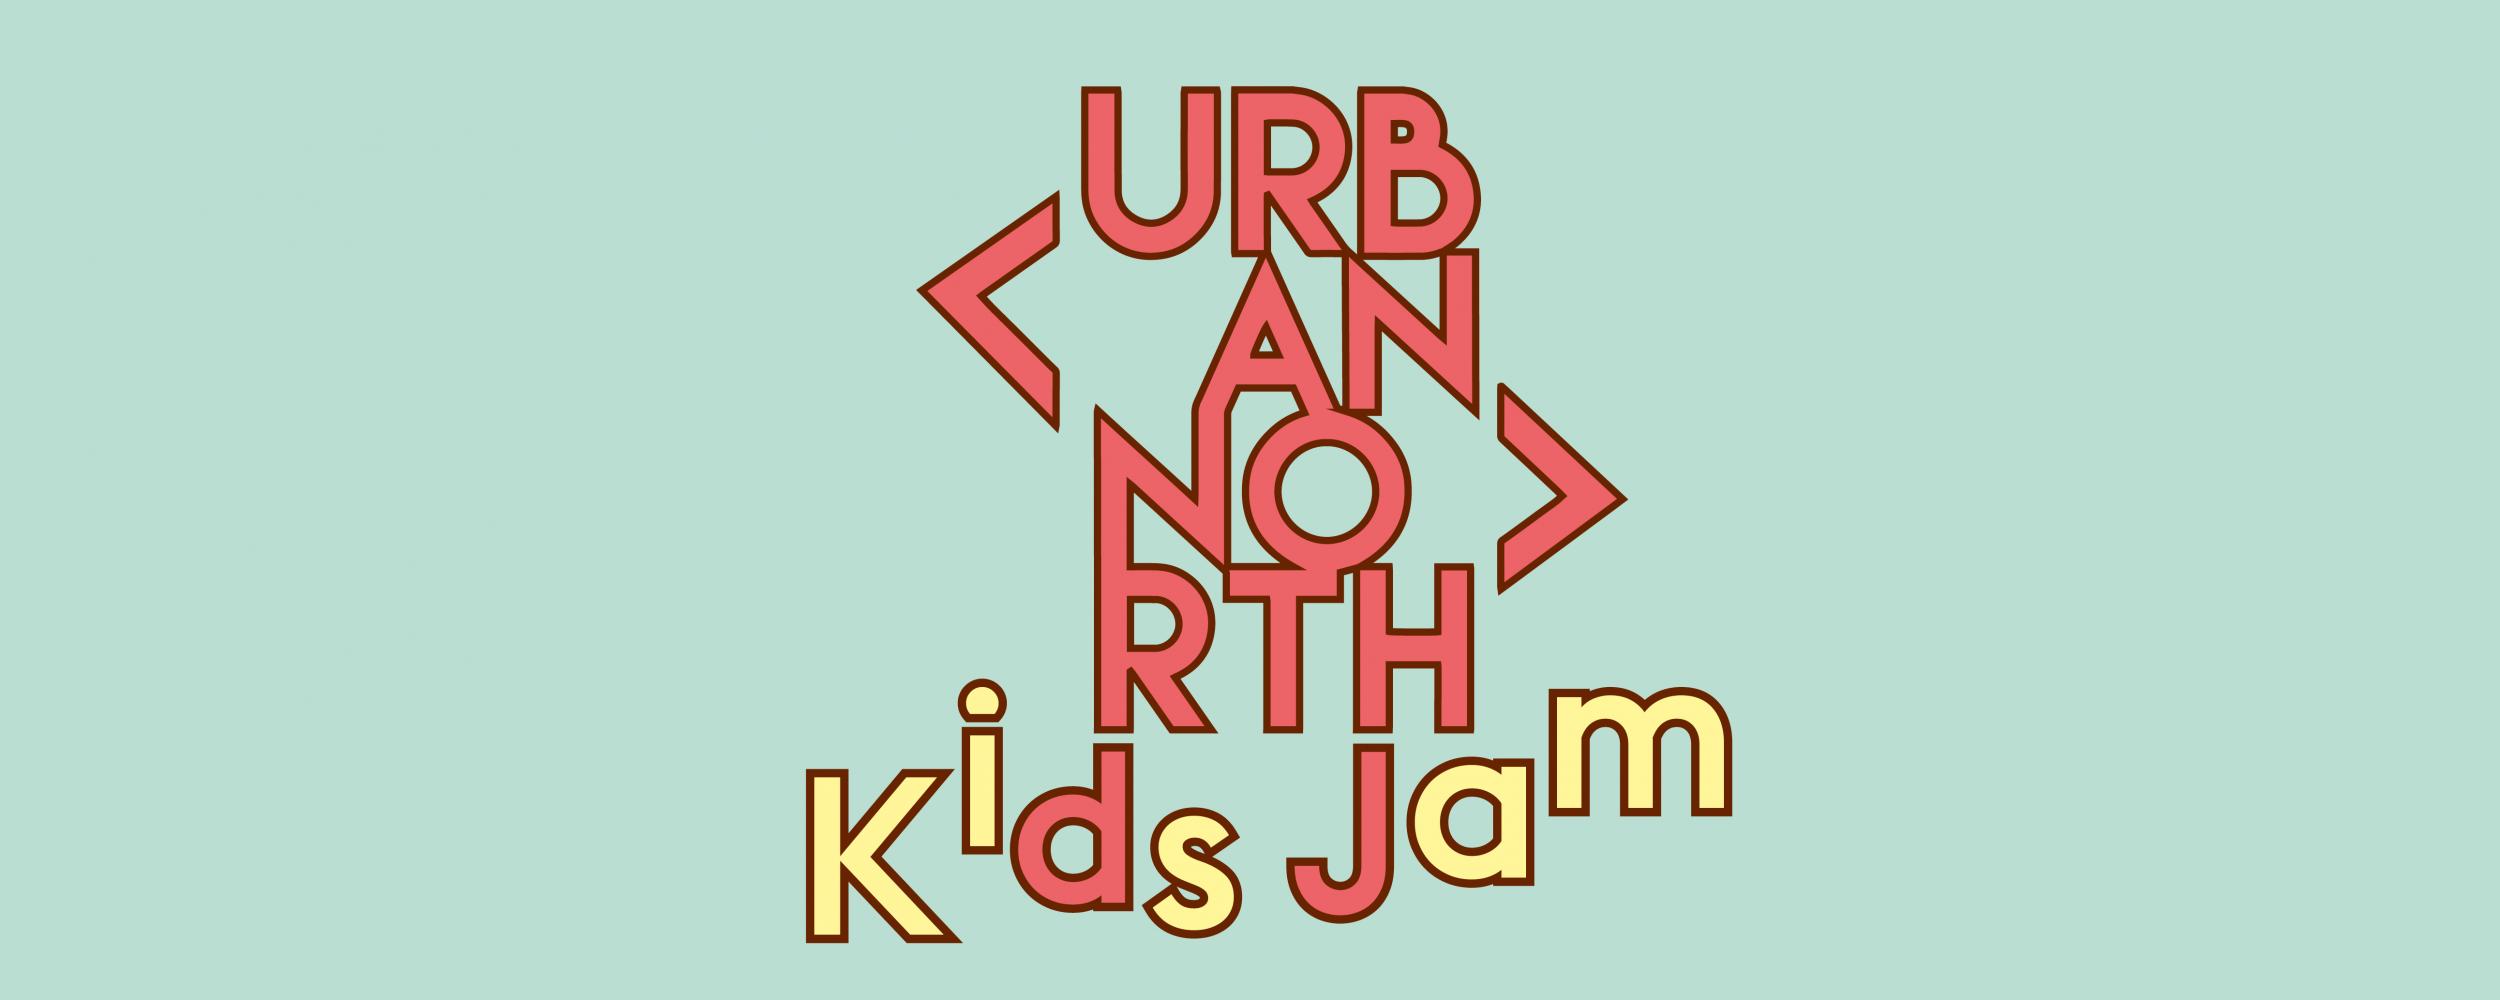 Urban North Kids Jam